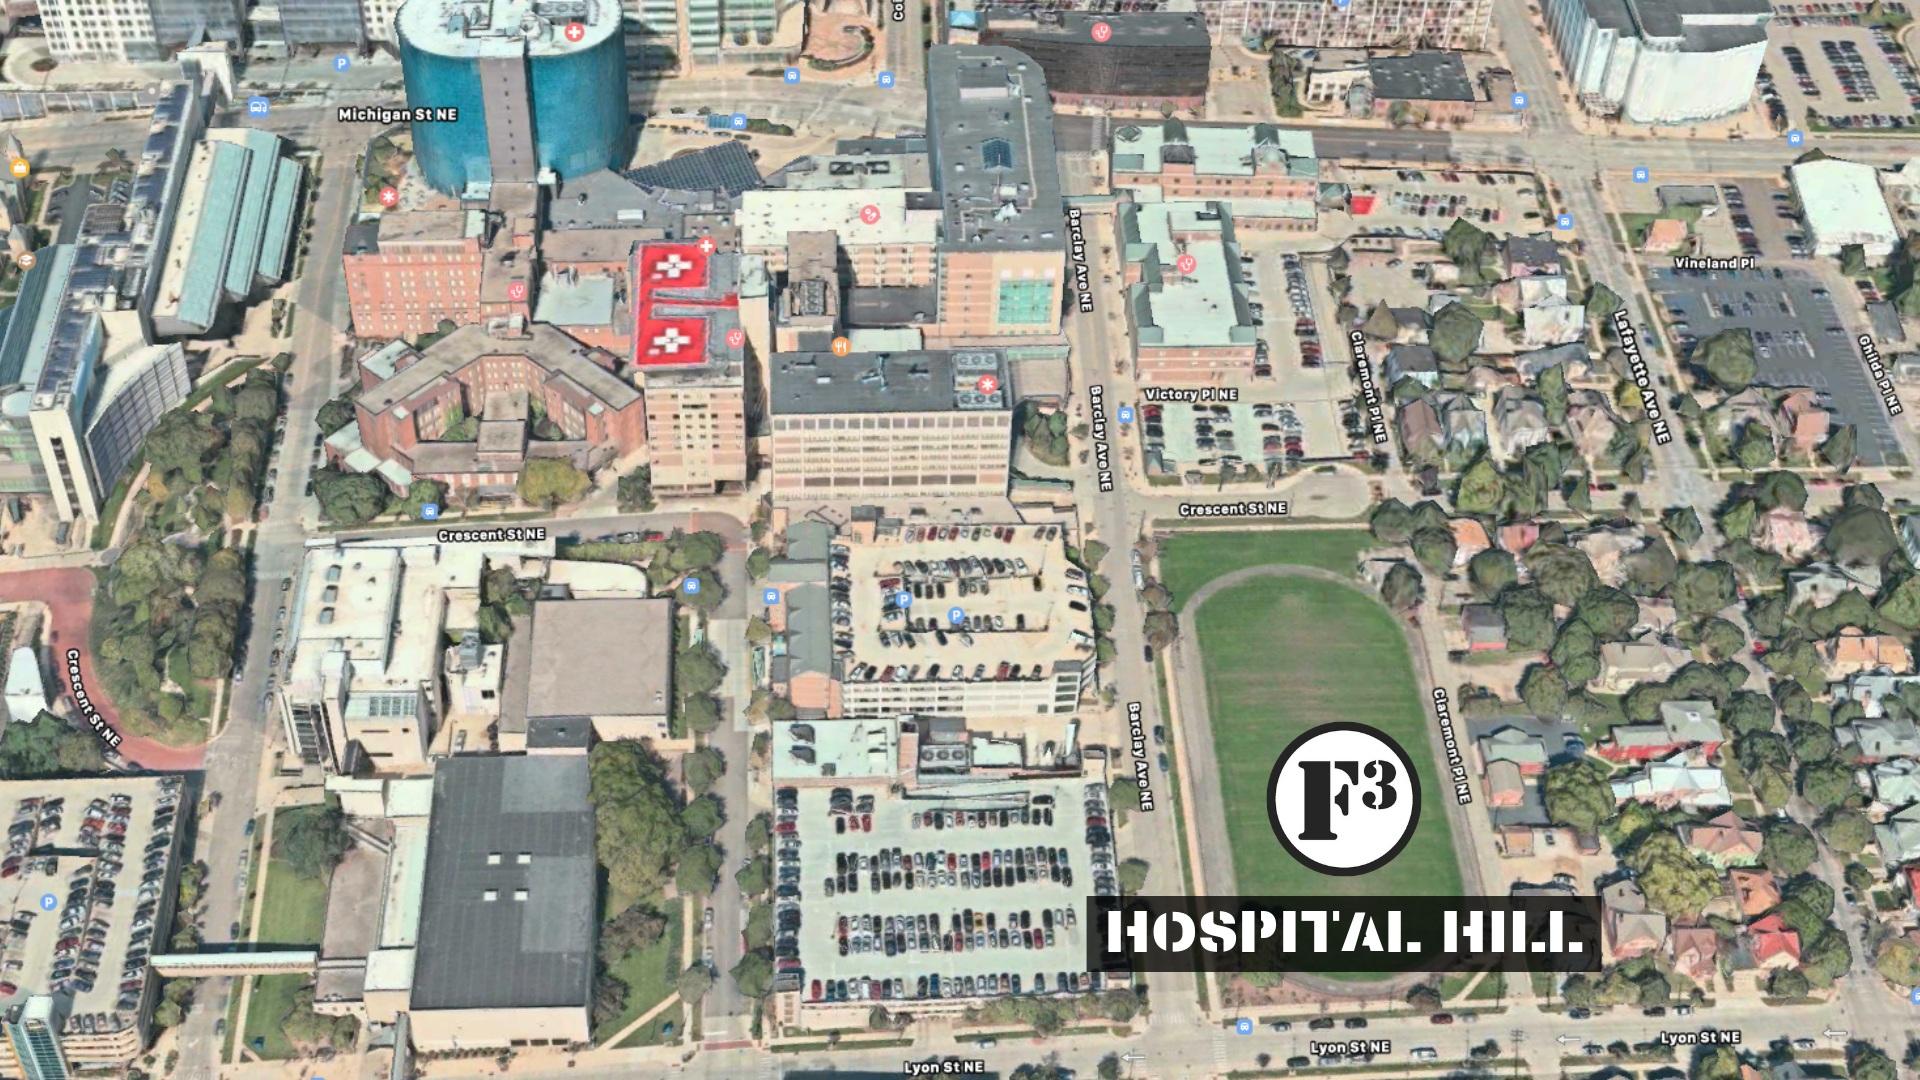 THURSDAYS | HOSPITAL HILL @ GRCC PRACTICE TRACK | 0530-0615